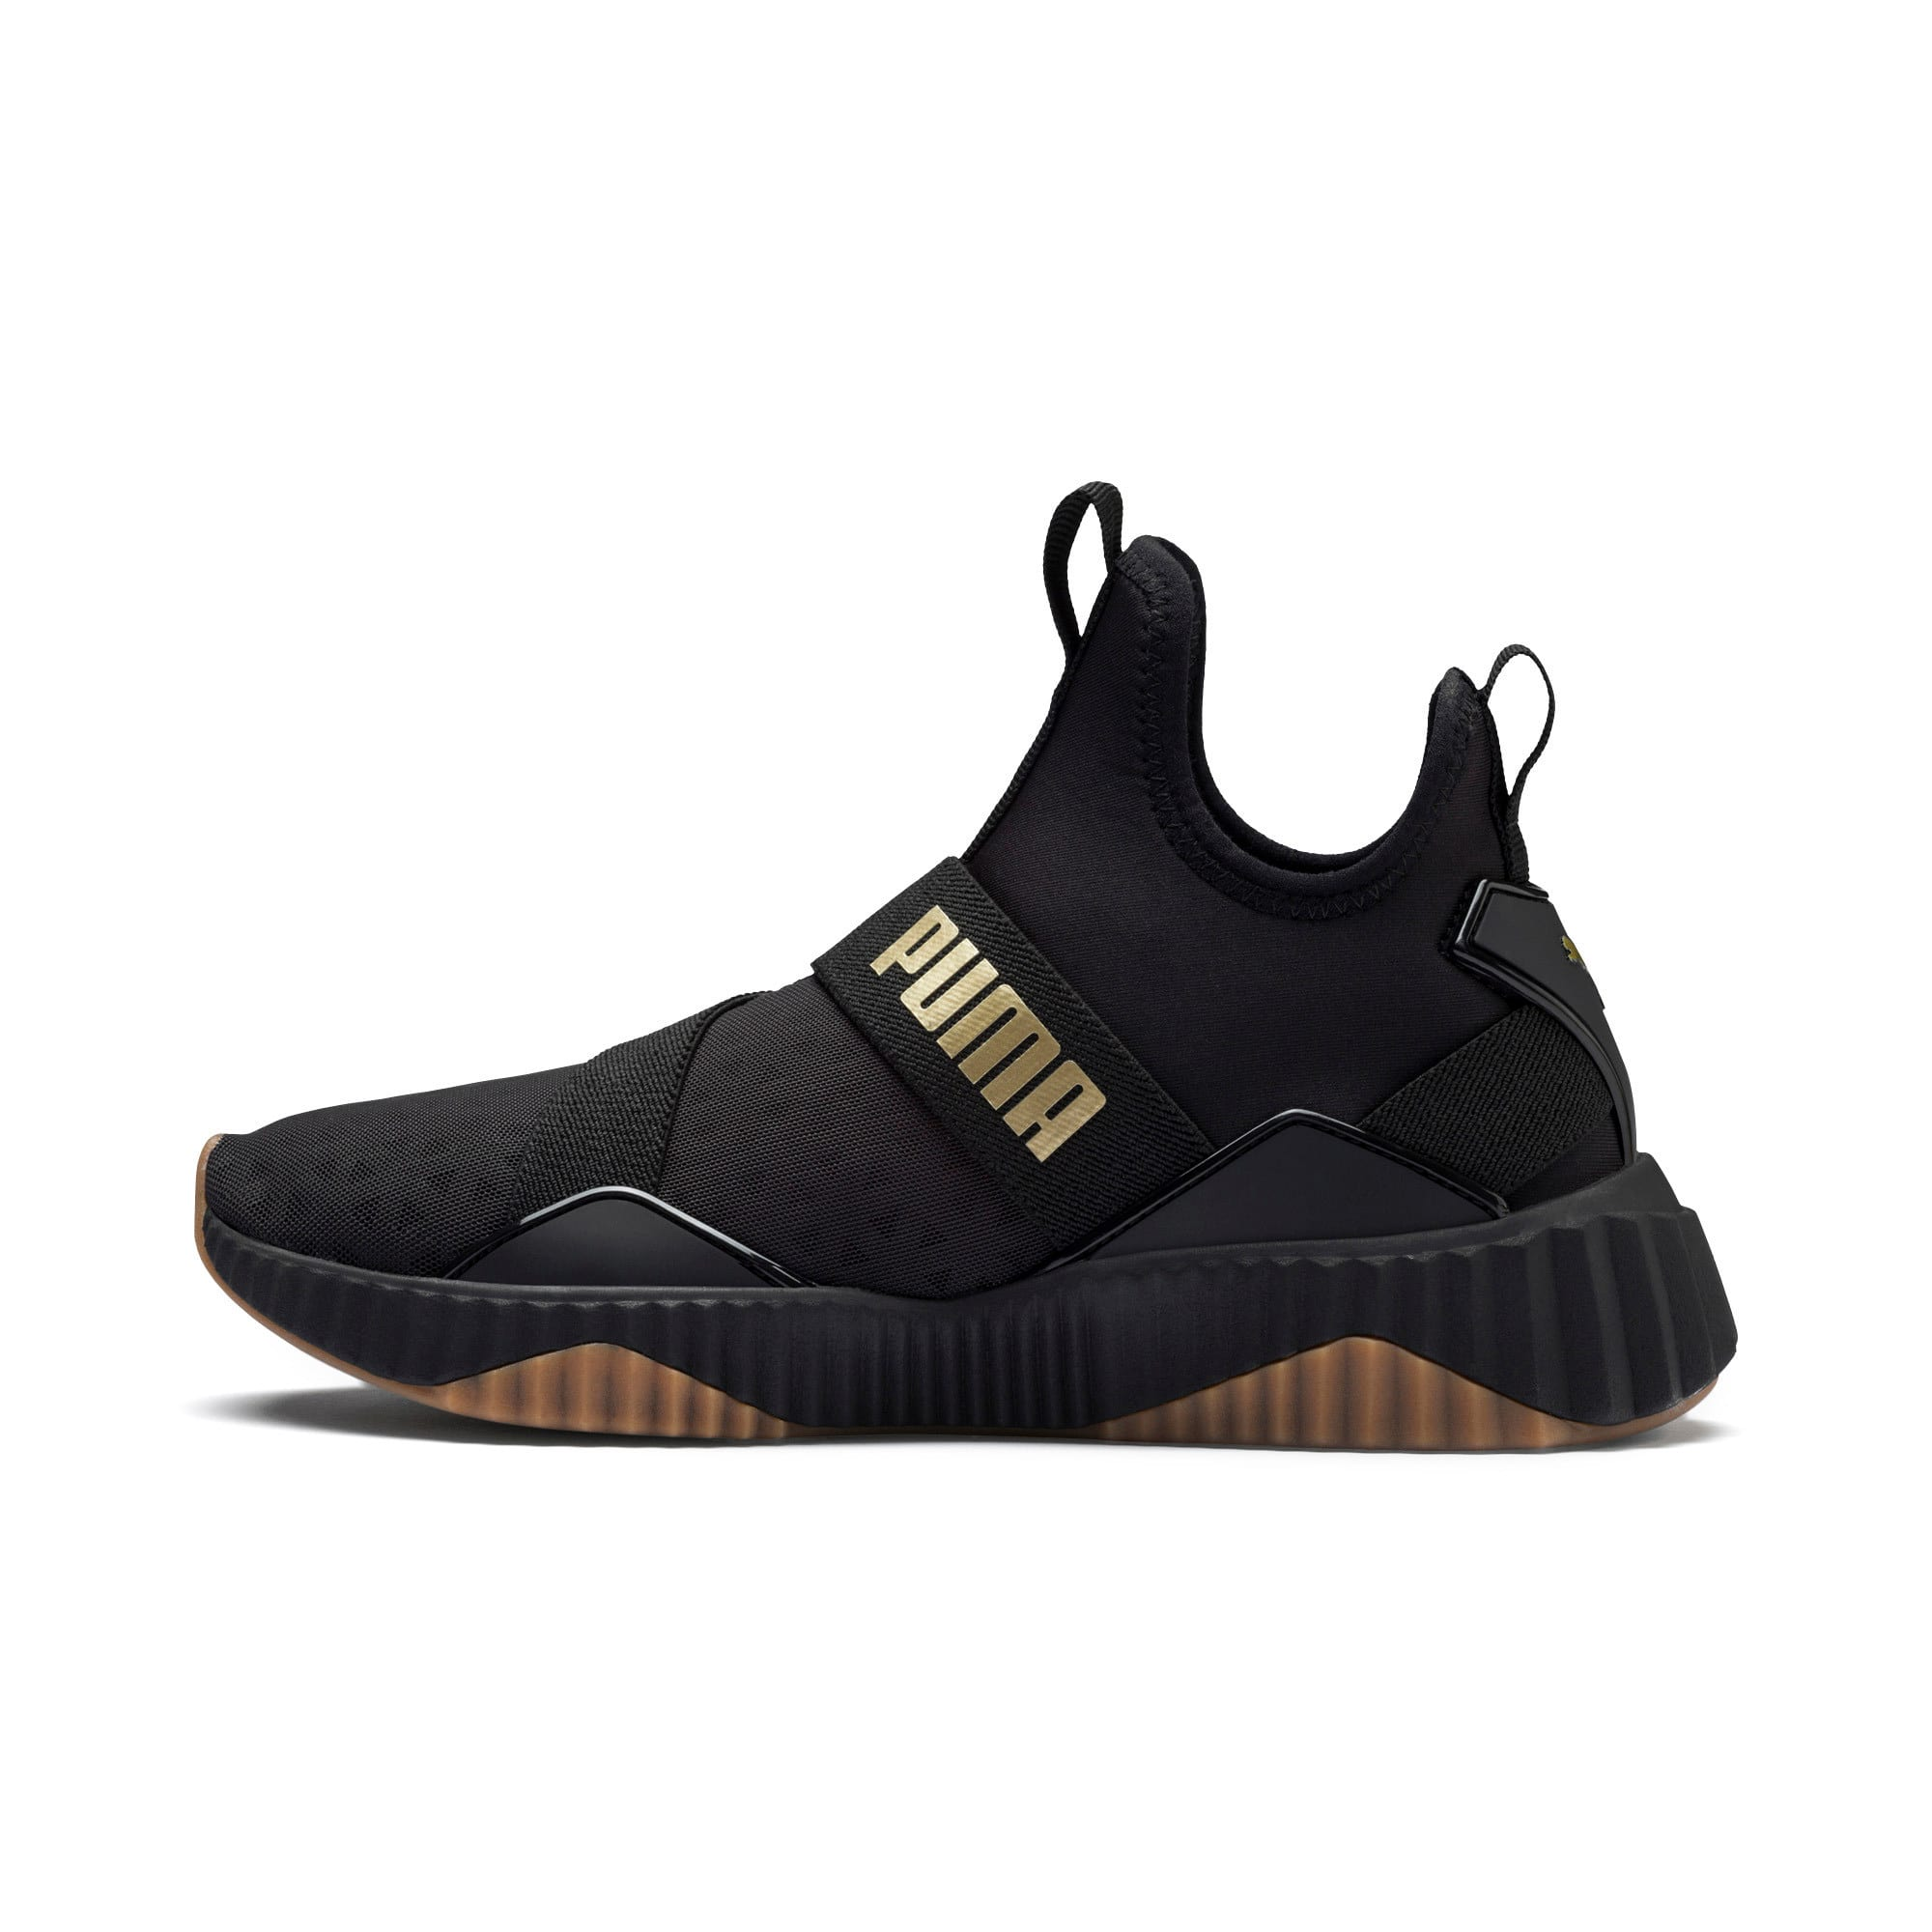 Thumbnail 1 of Defy Mid Sparkle Damen Sneaker, Puma Black-Metallic Gold, medium